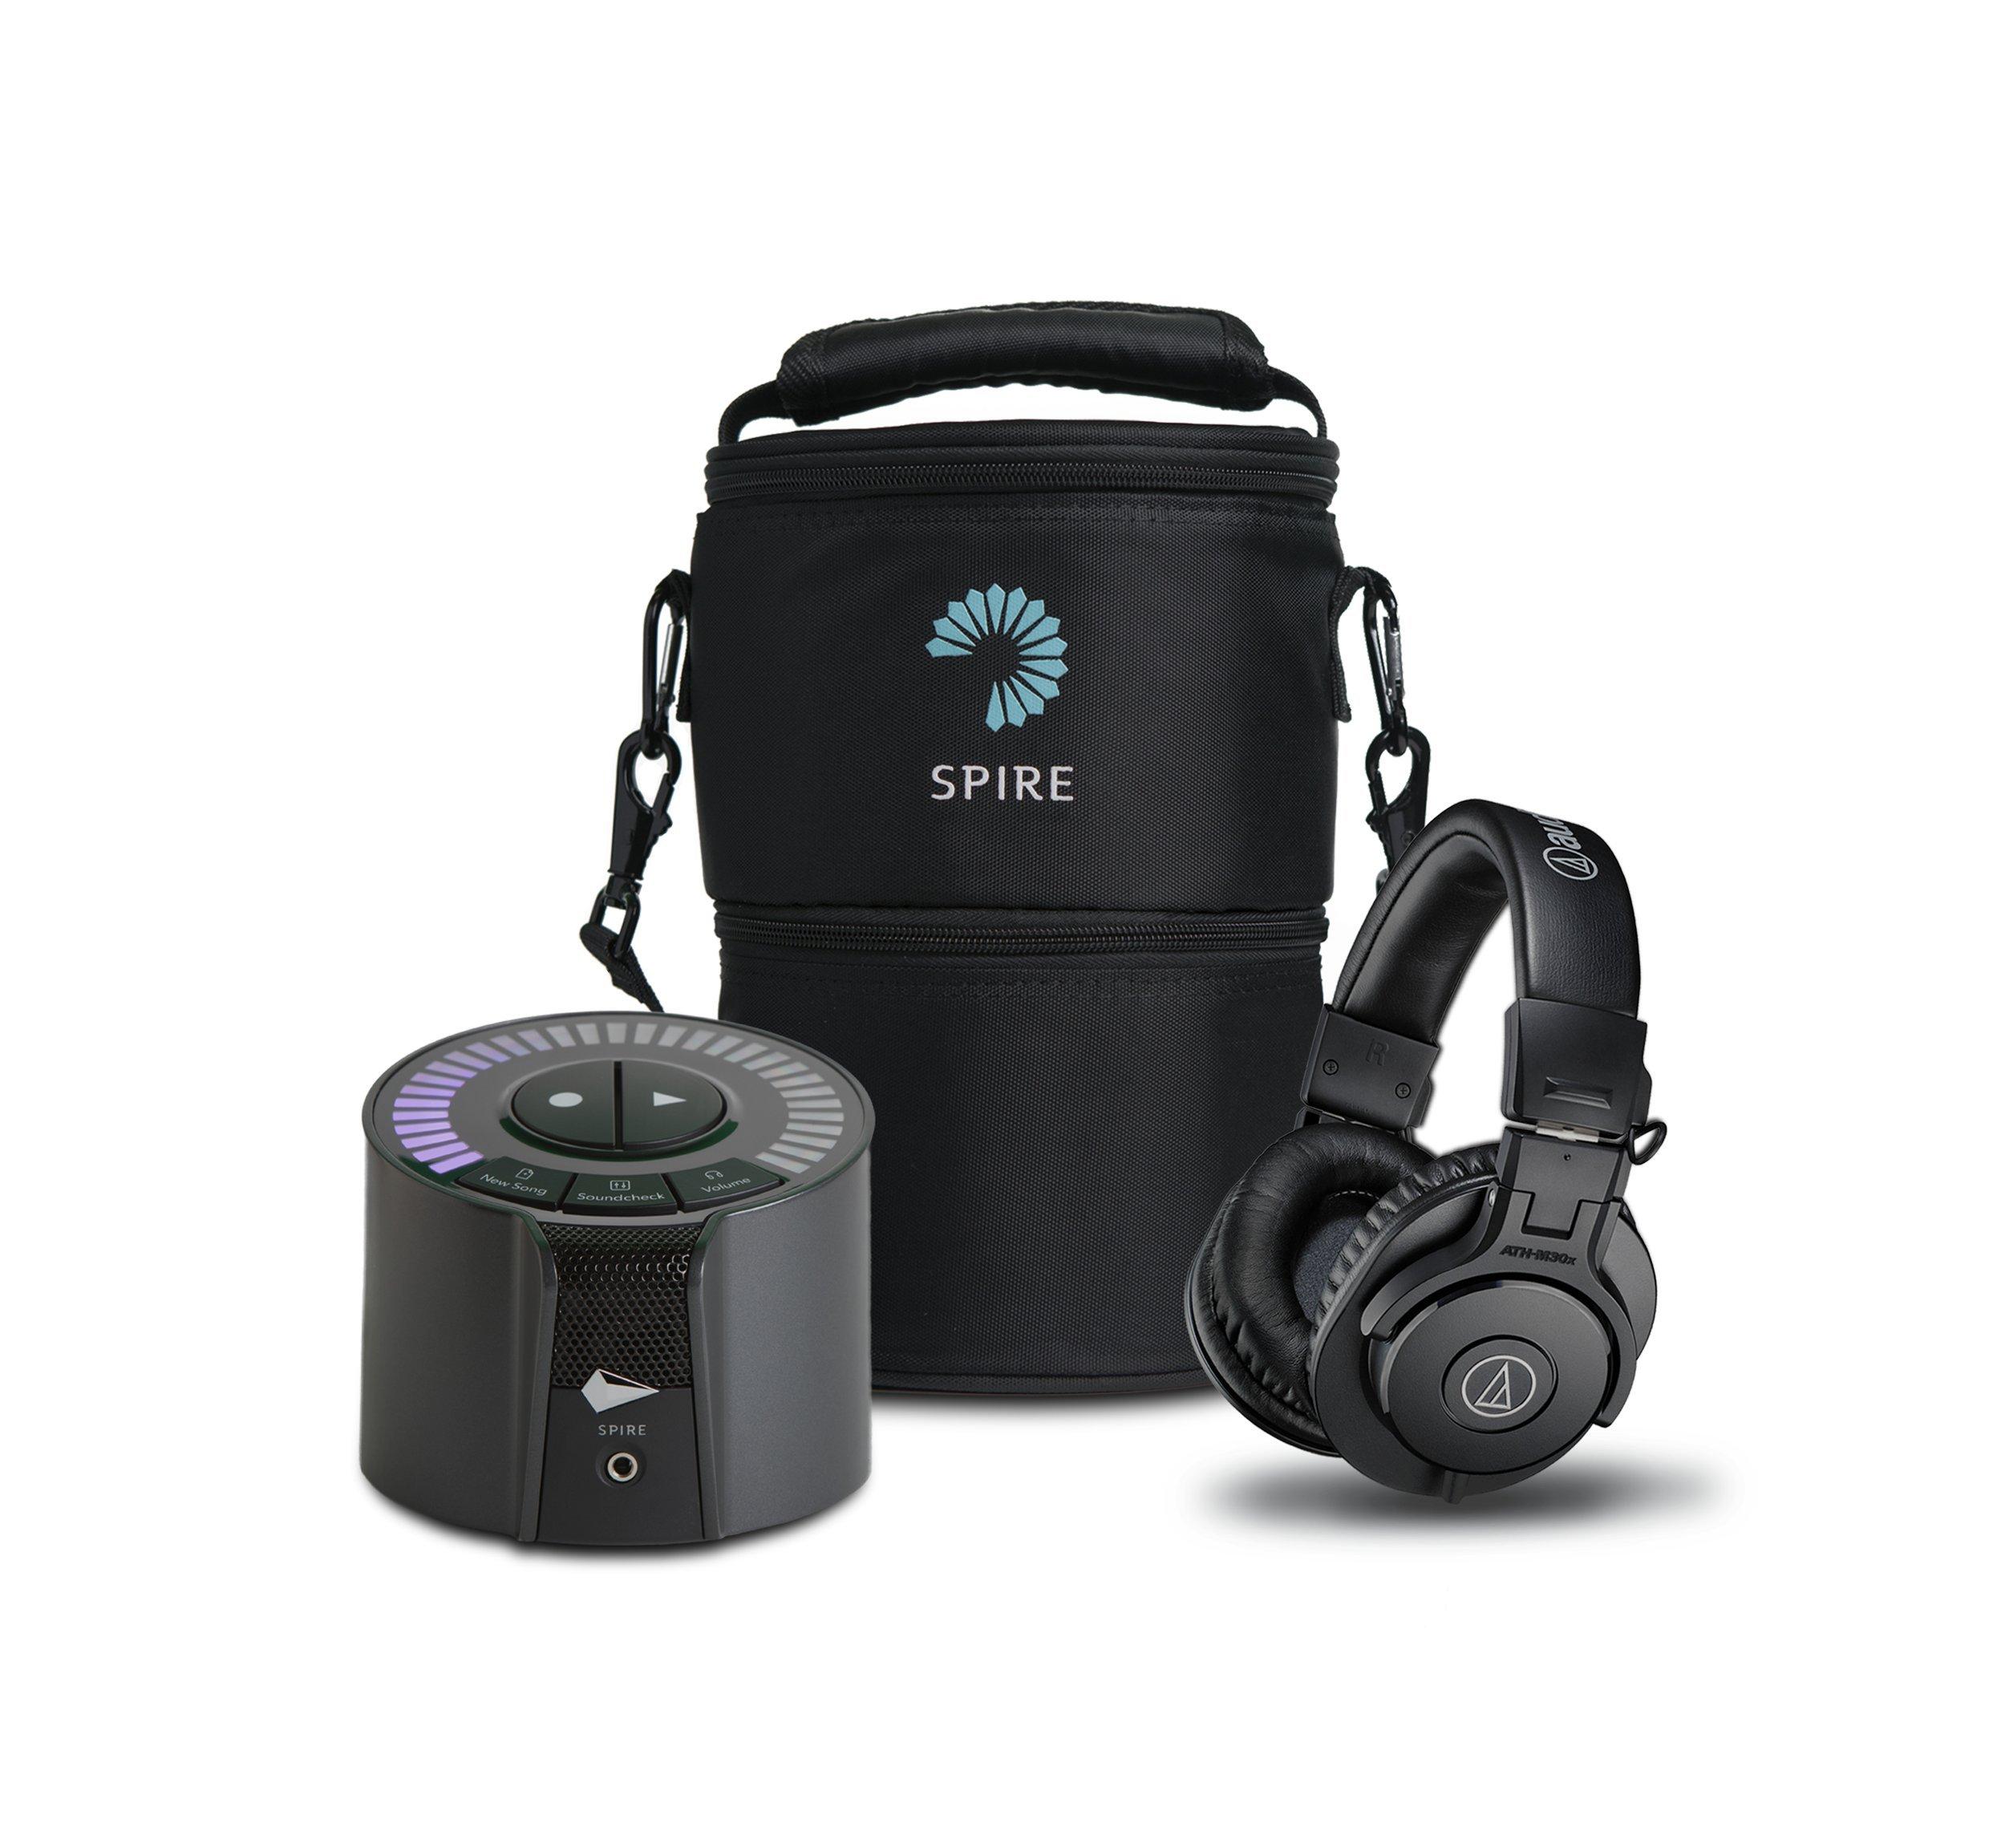 iZotope Road Warrior Bundle-Spire Studio, Travel Bag, Audio Technica Headphones, Black